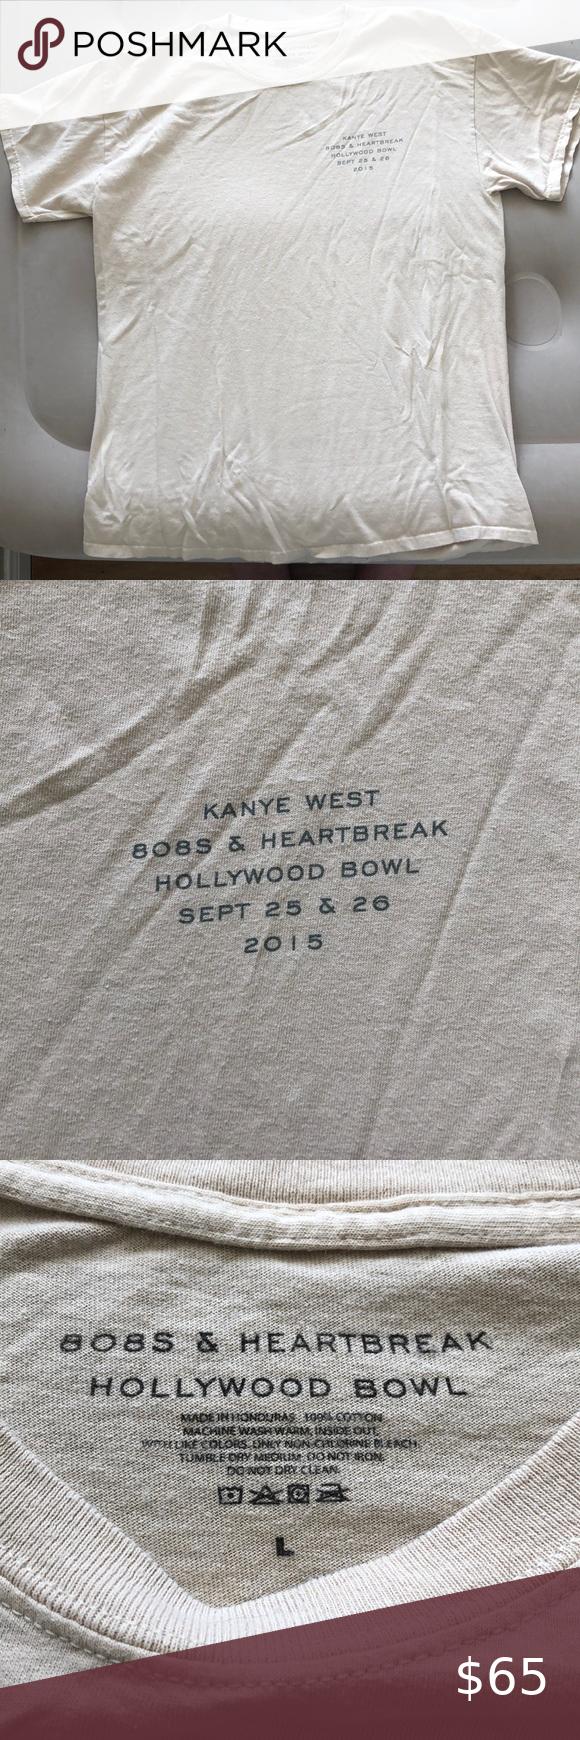 Kanye West 808s And Heartbreak Tour Merch T Shirt In 2020 Tour Merch Kanye West Kanye